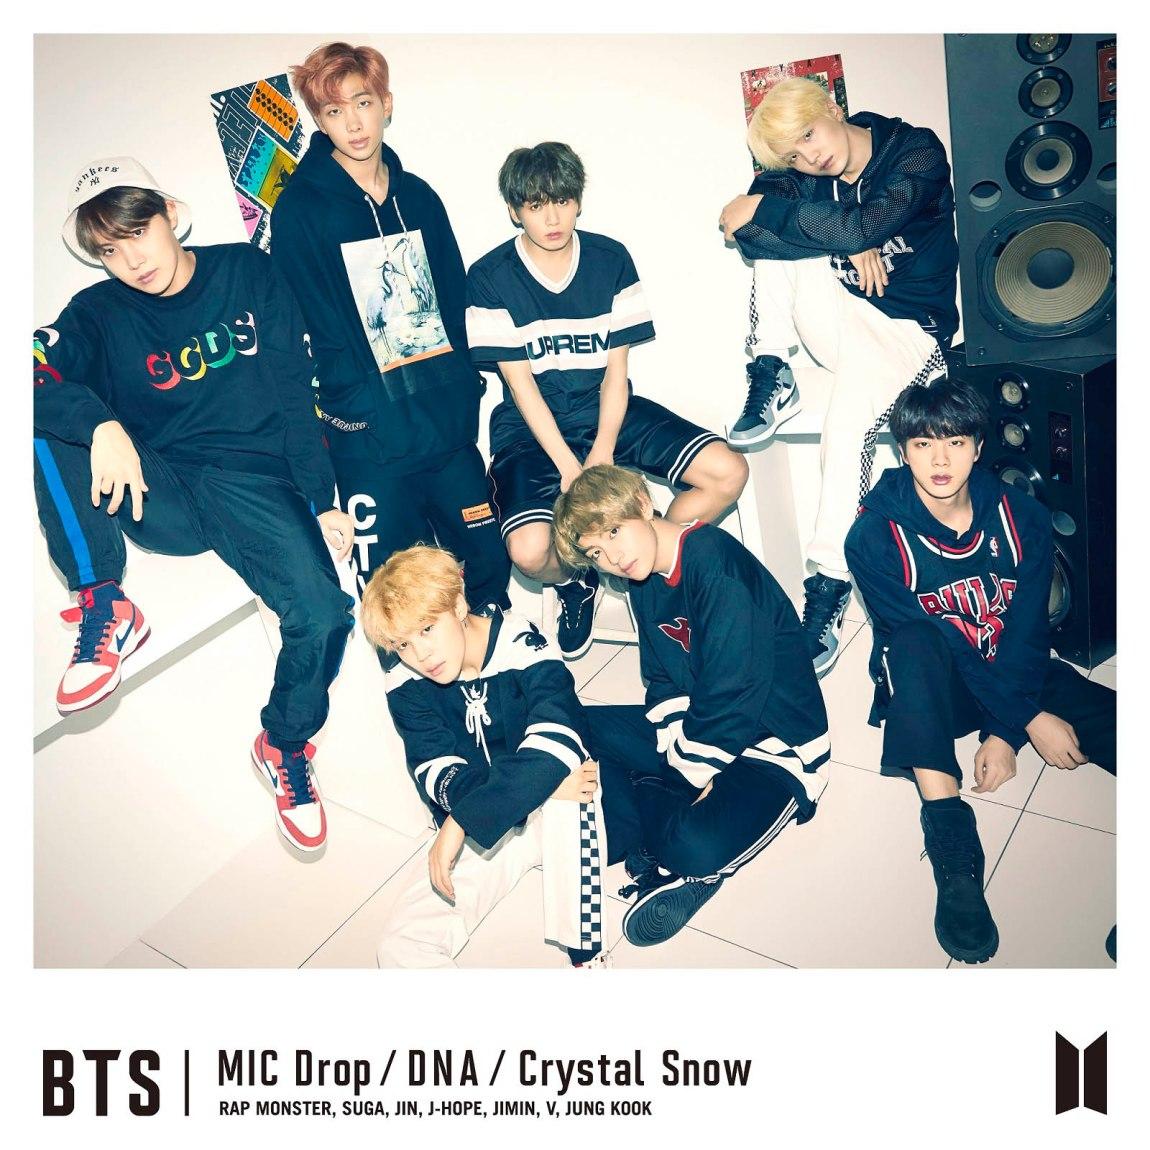 BTS' latest Japanese album becomes platinum